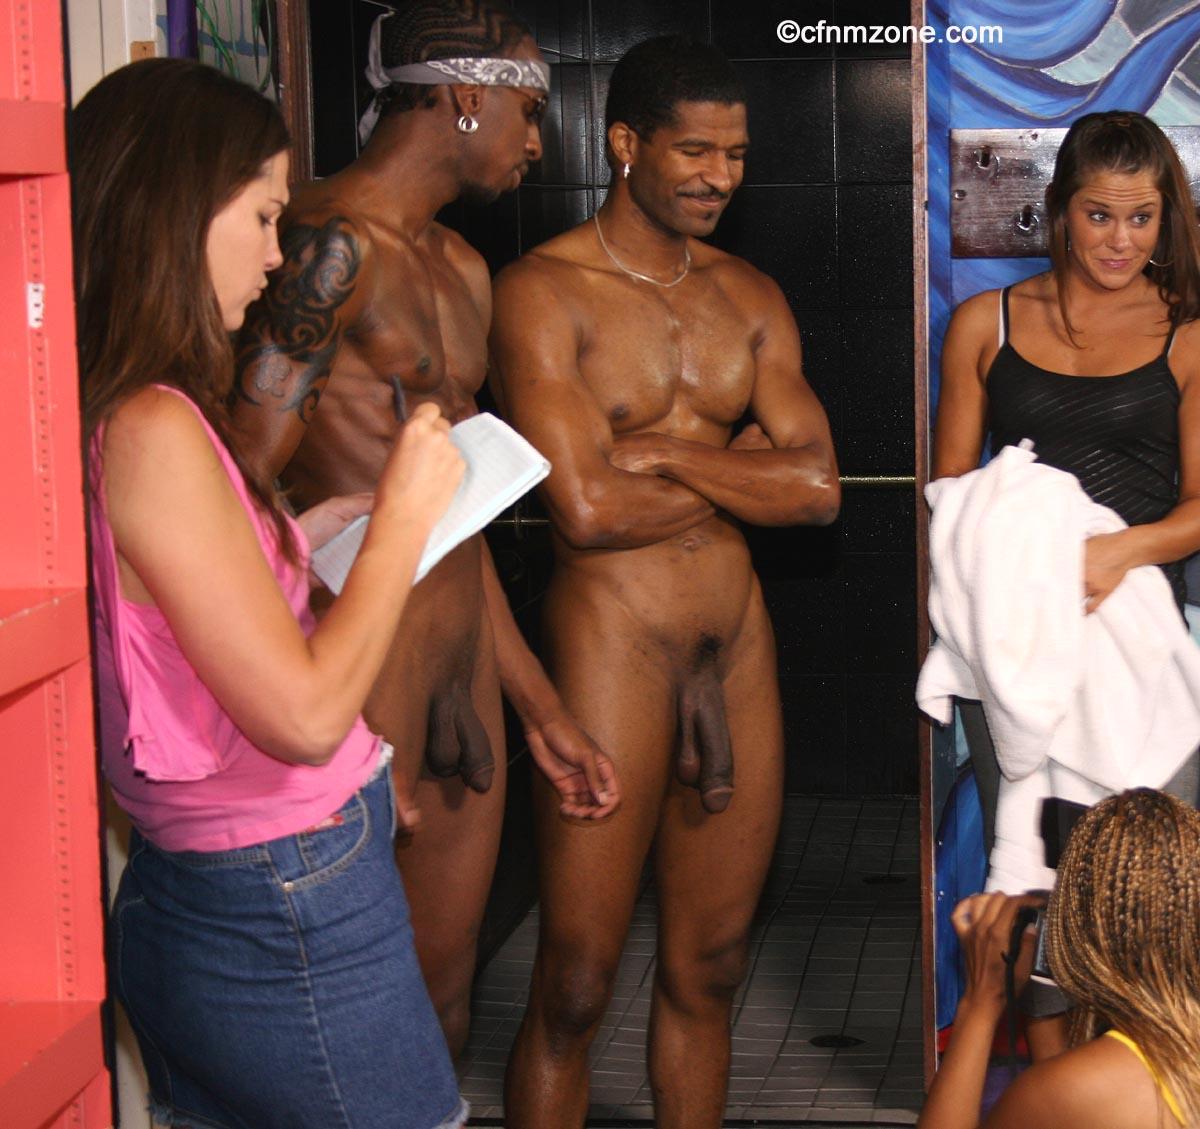 cfnm naked interviews